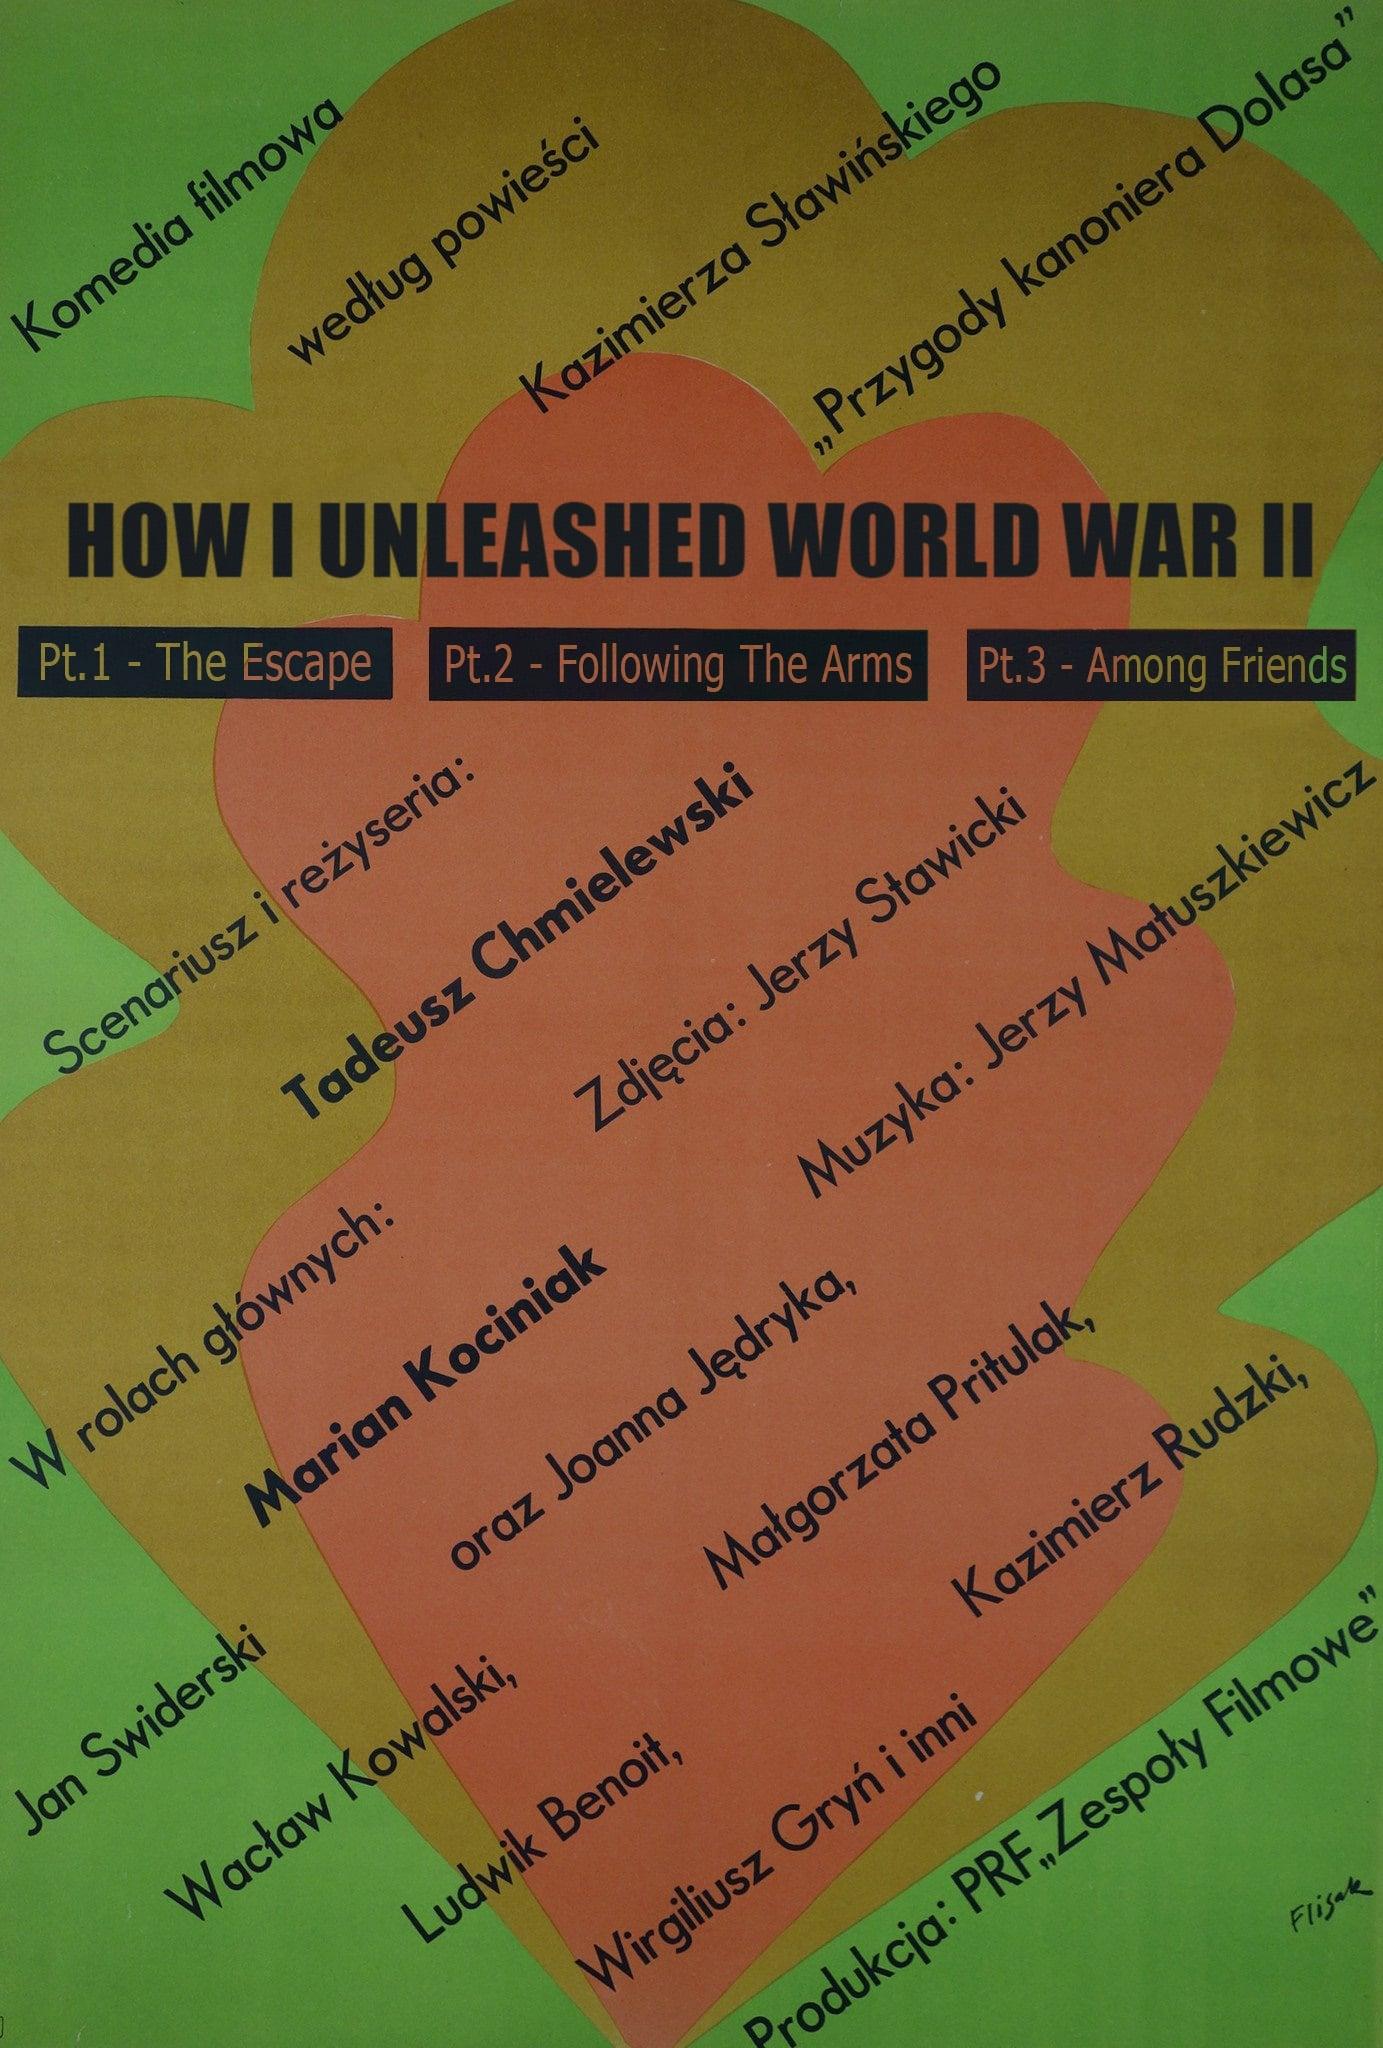 How I Unleashed World War II